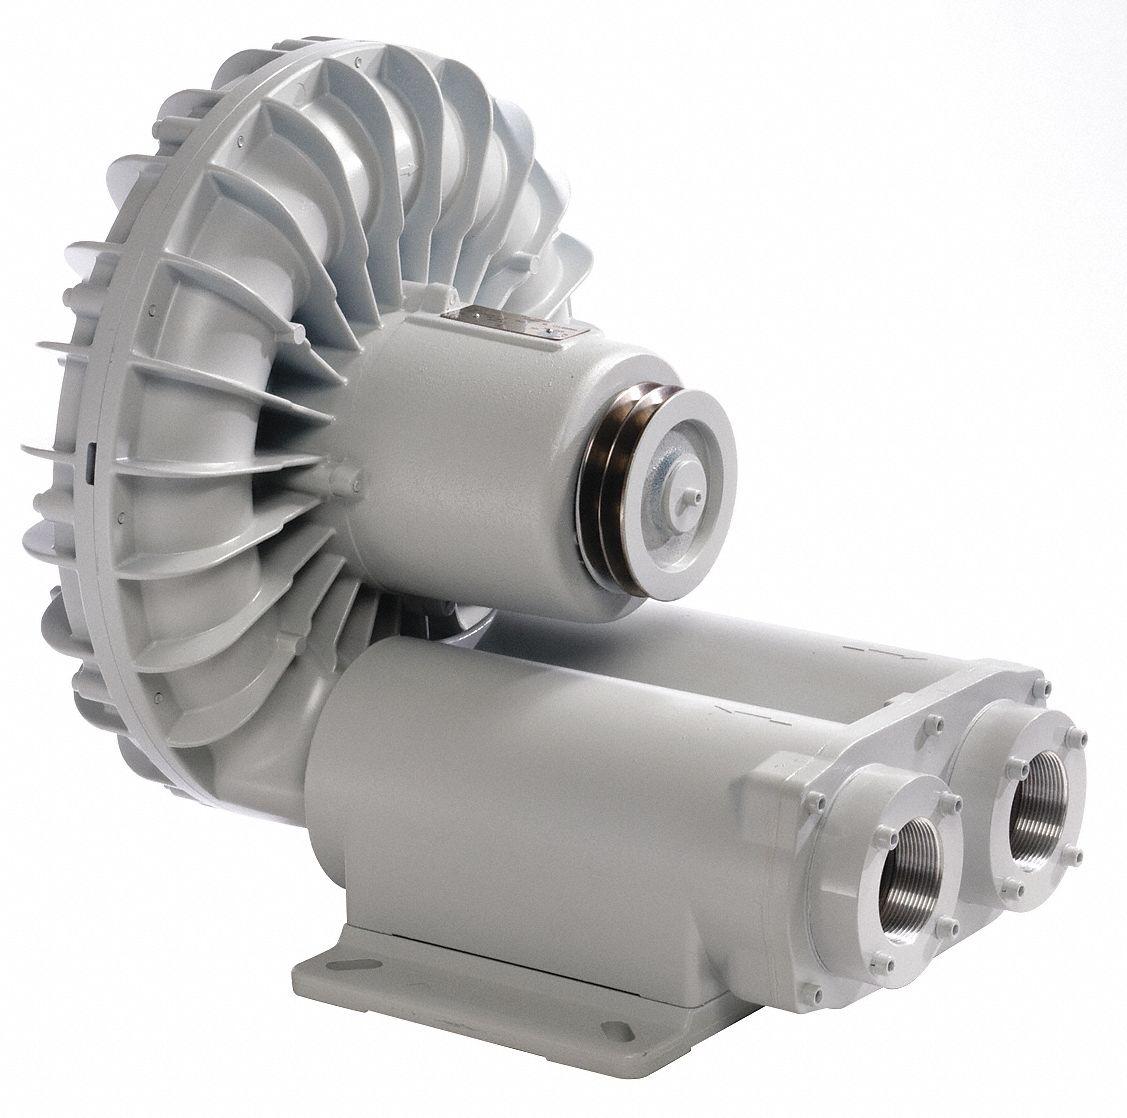 Gast 1 3 Hp Air Compressors Vacuum Pumps Wiring Diagram